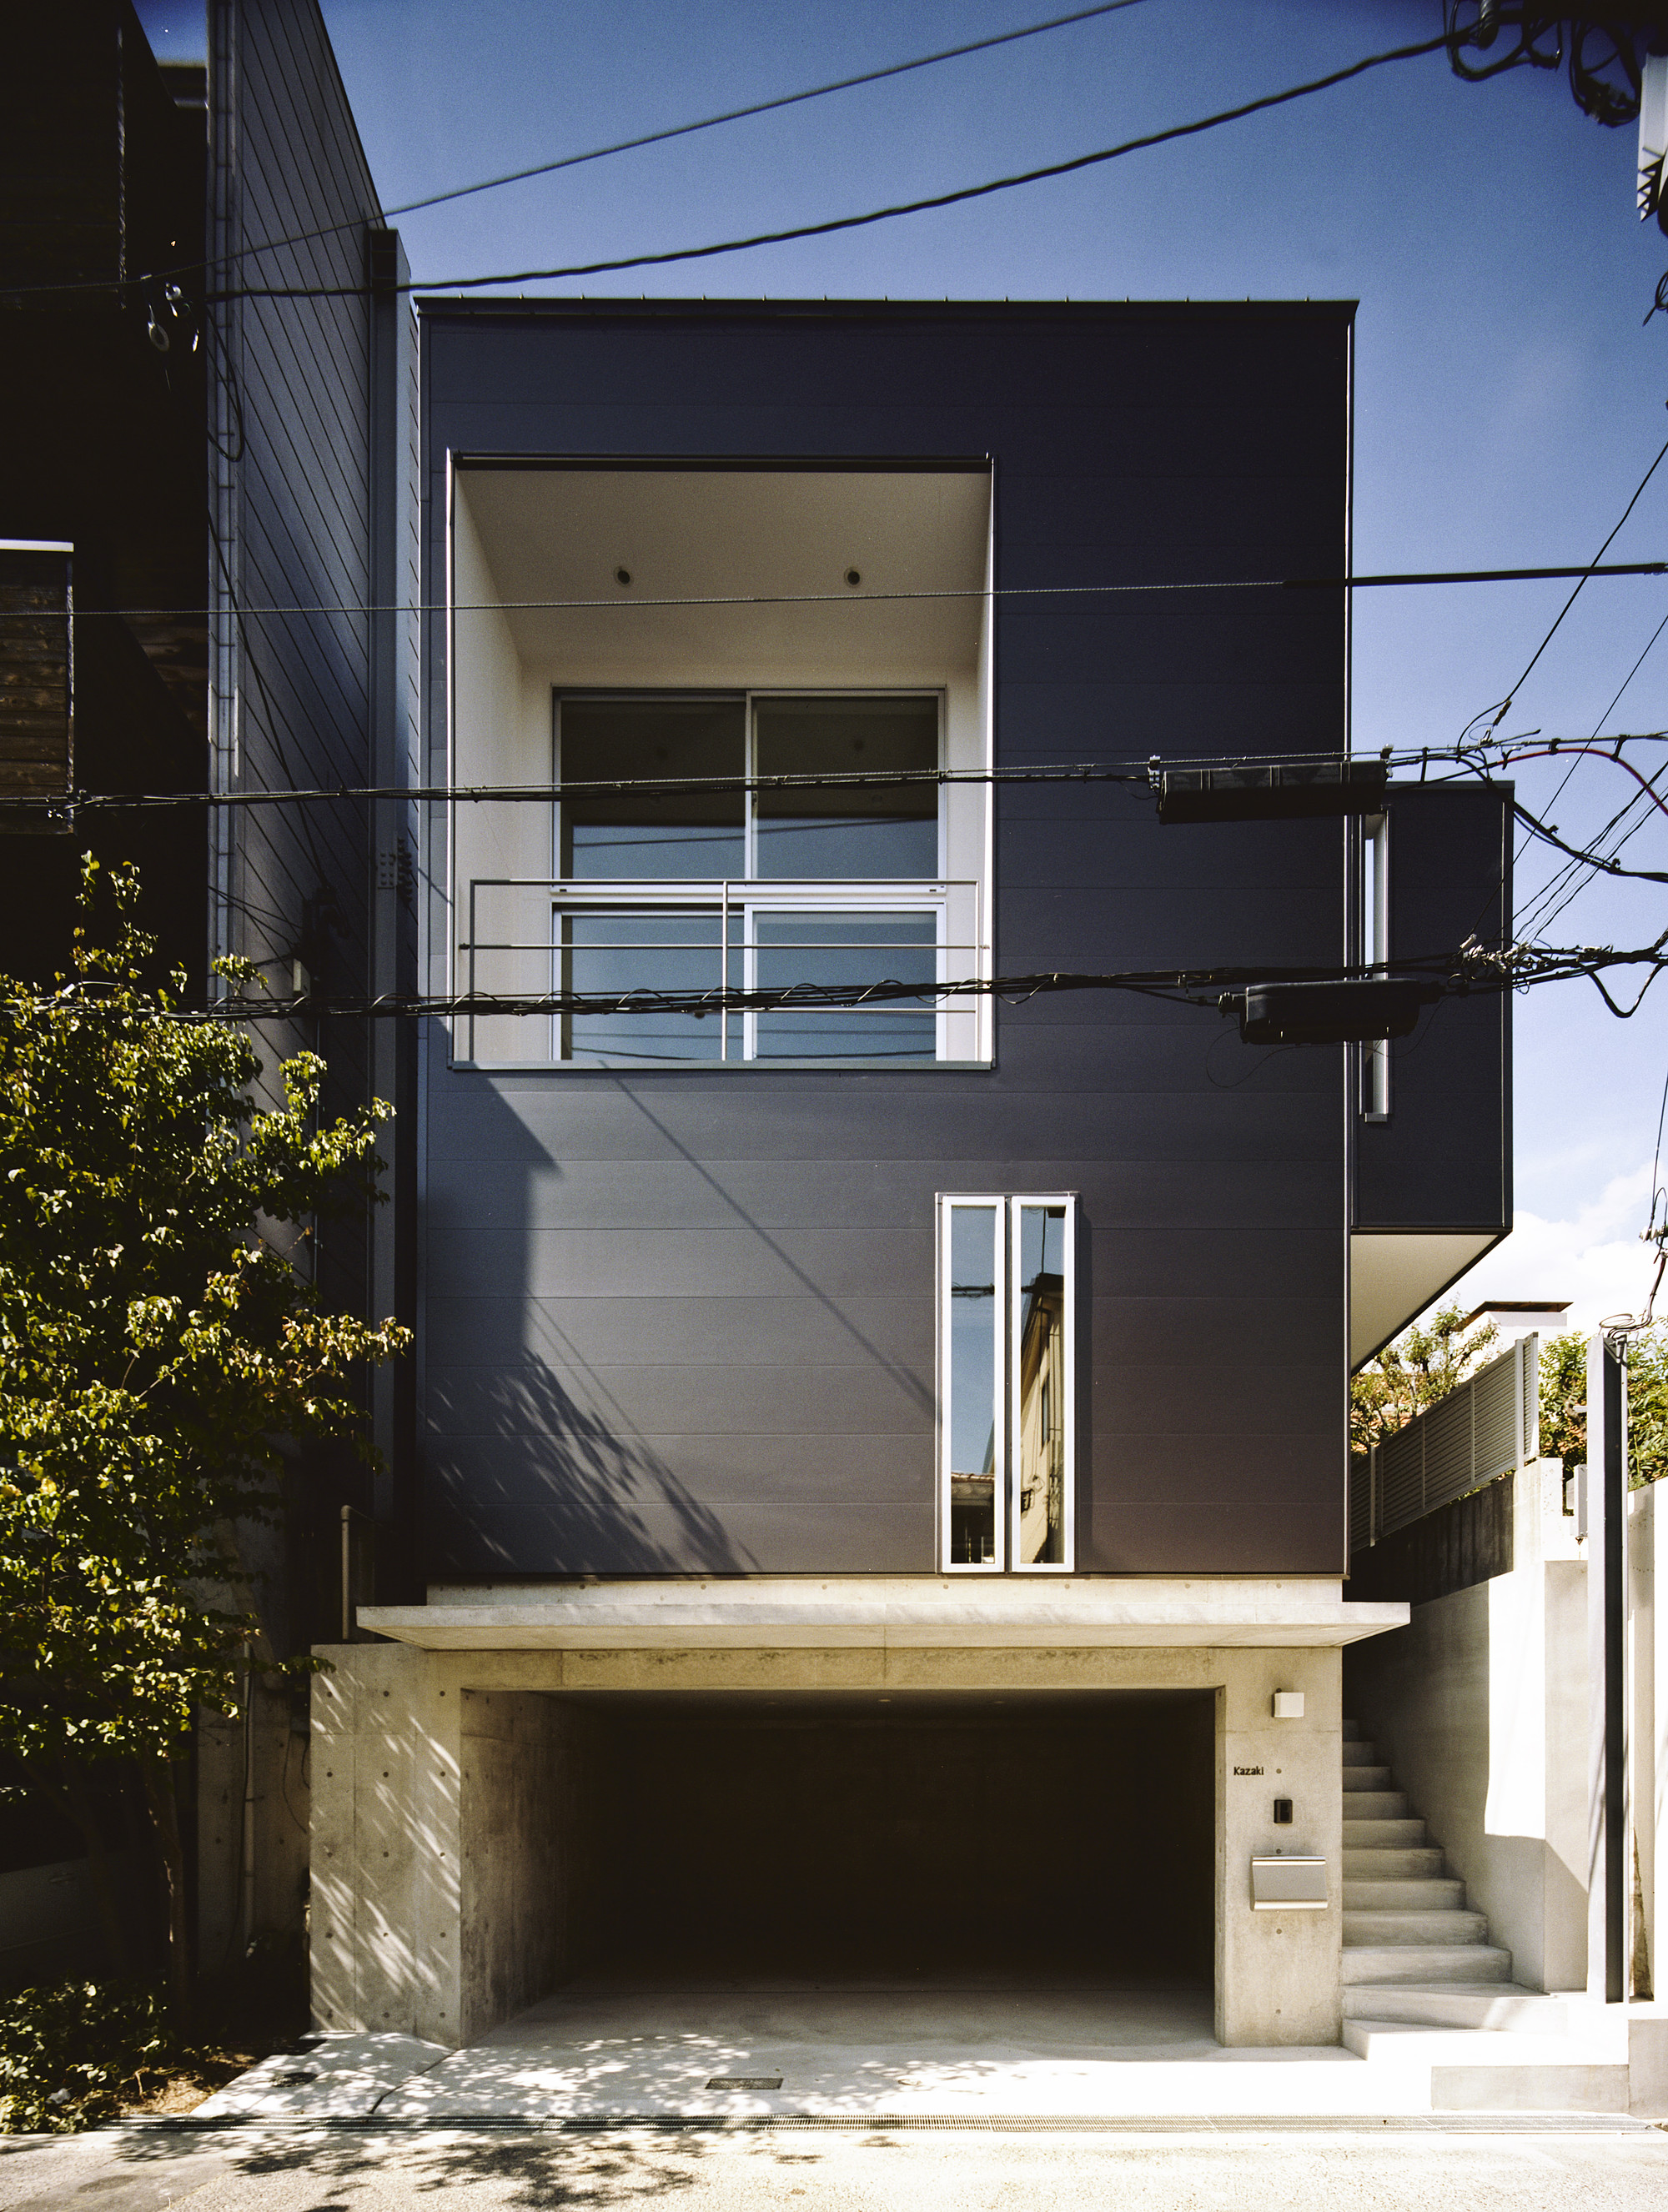 Casa en Konan / Coo Planning